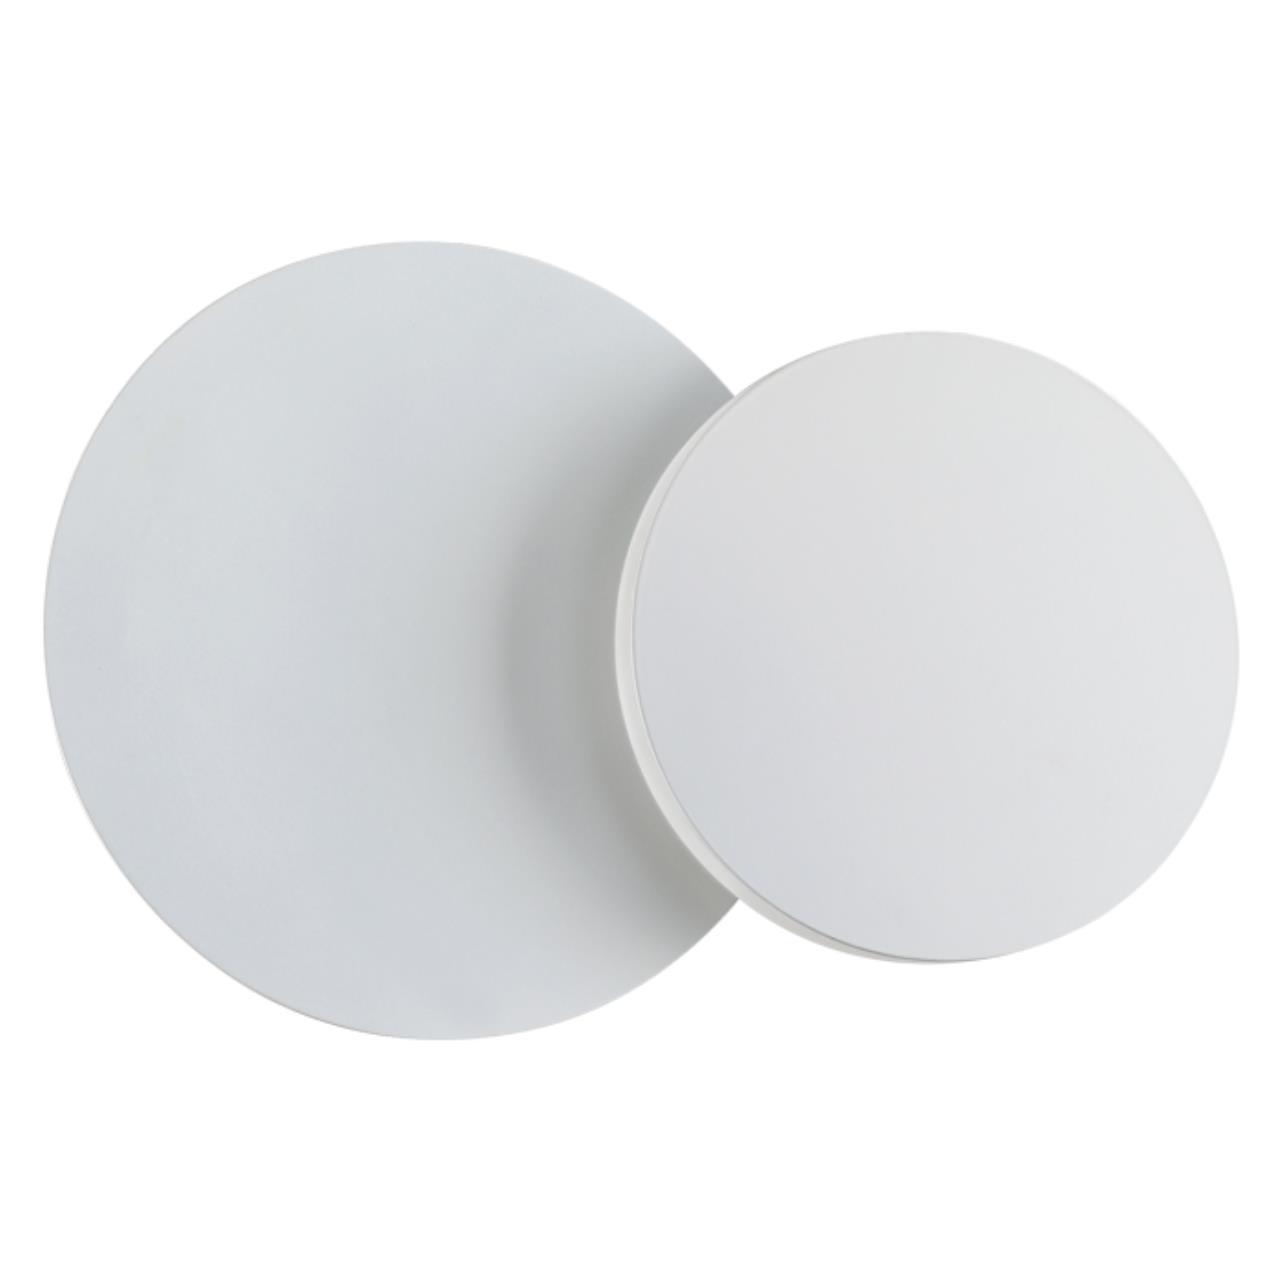 357857 OVER NT18 063 белый Накладной светильник IP20 LED 3000К 11W 170-240V SMENA